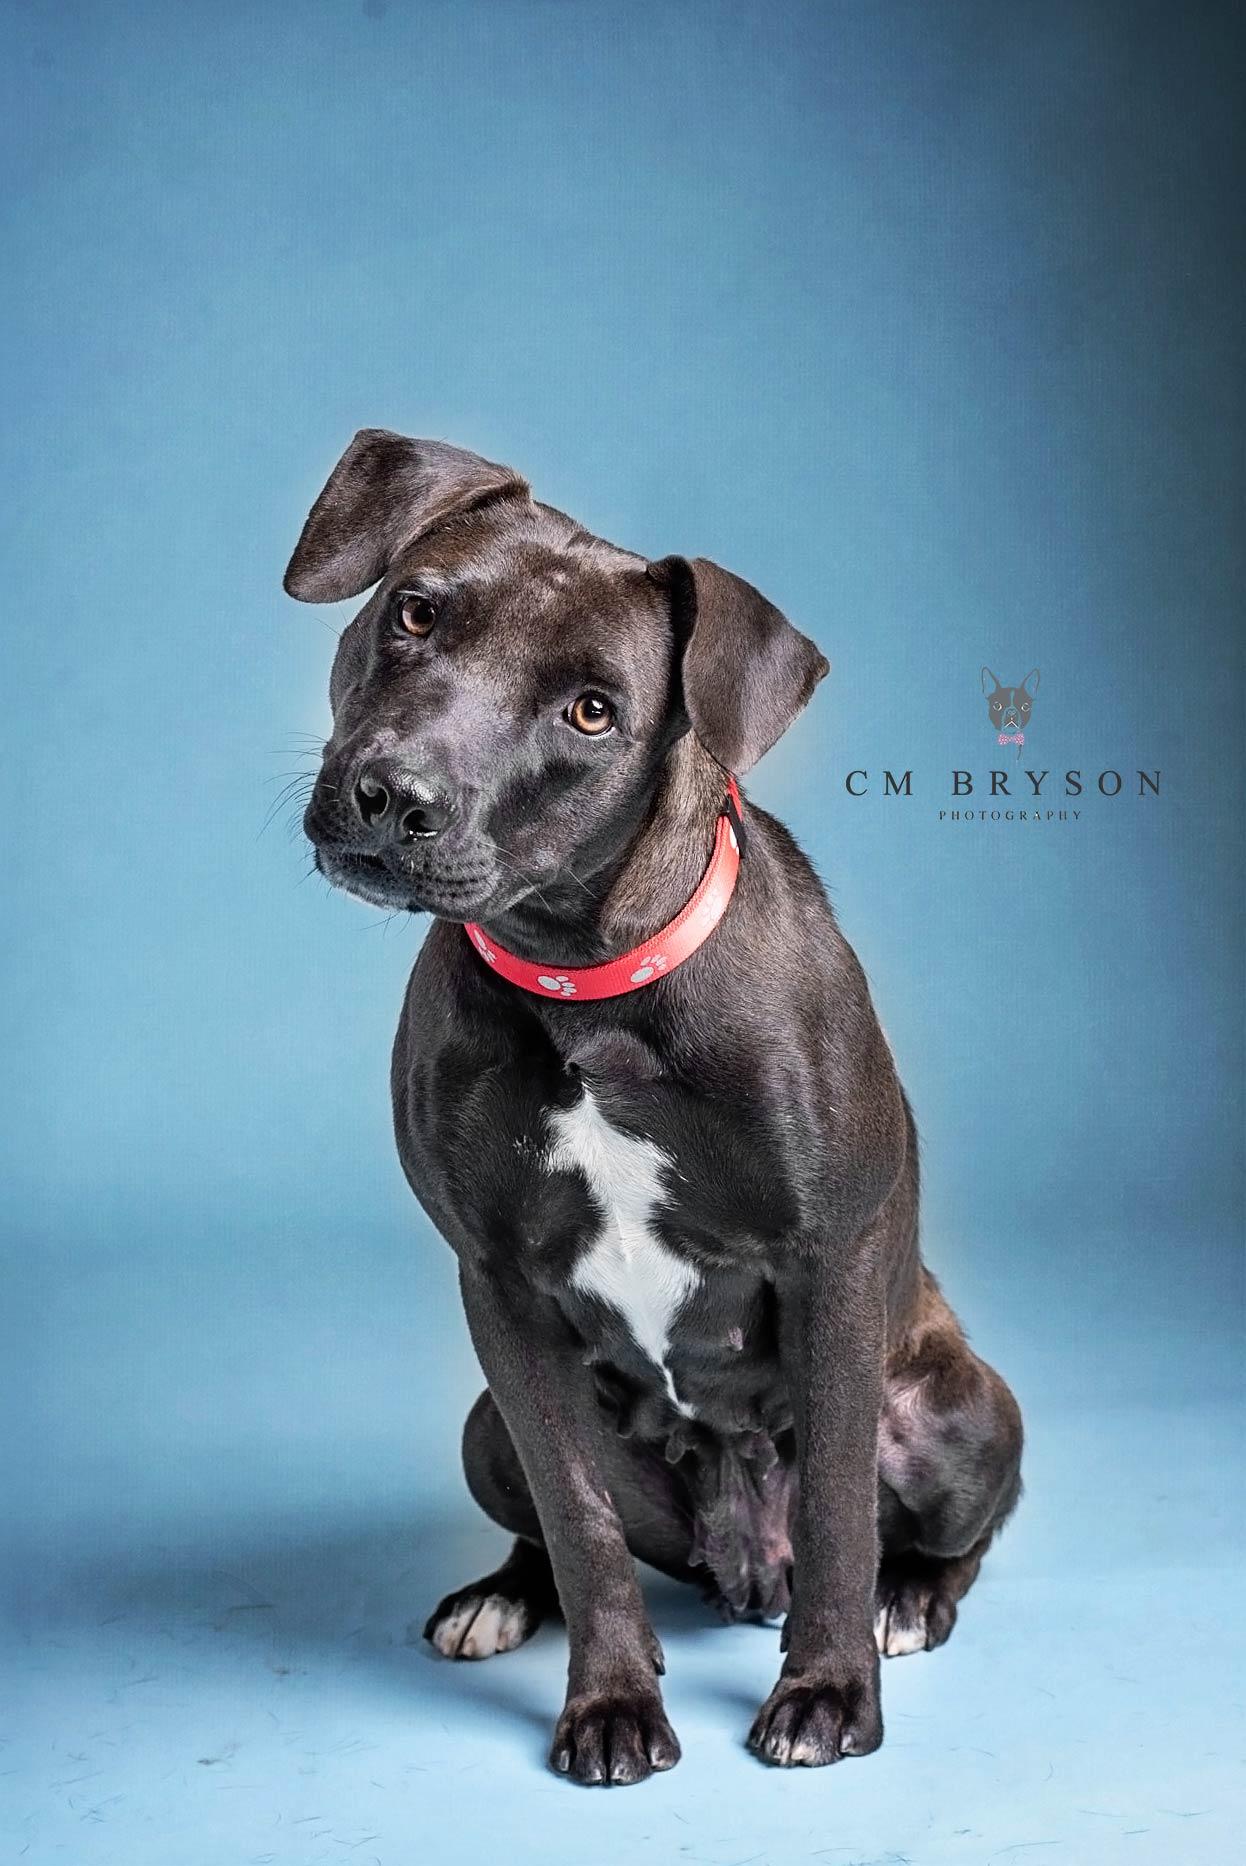 Cricket - Lab or Heeler Mix - Adoptable Dog